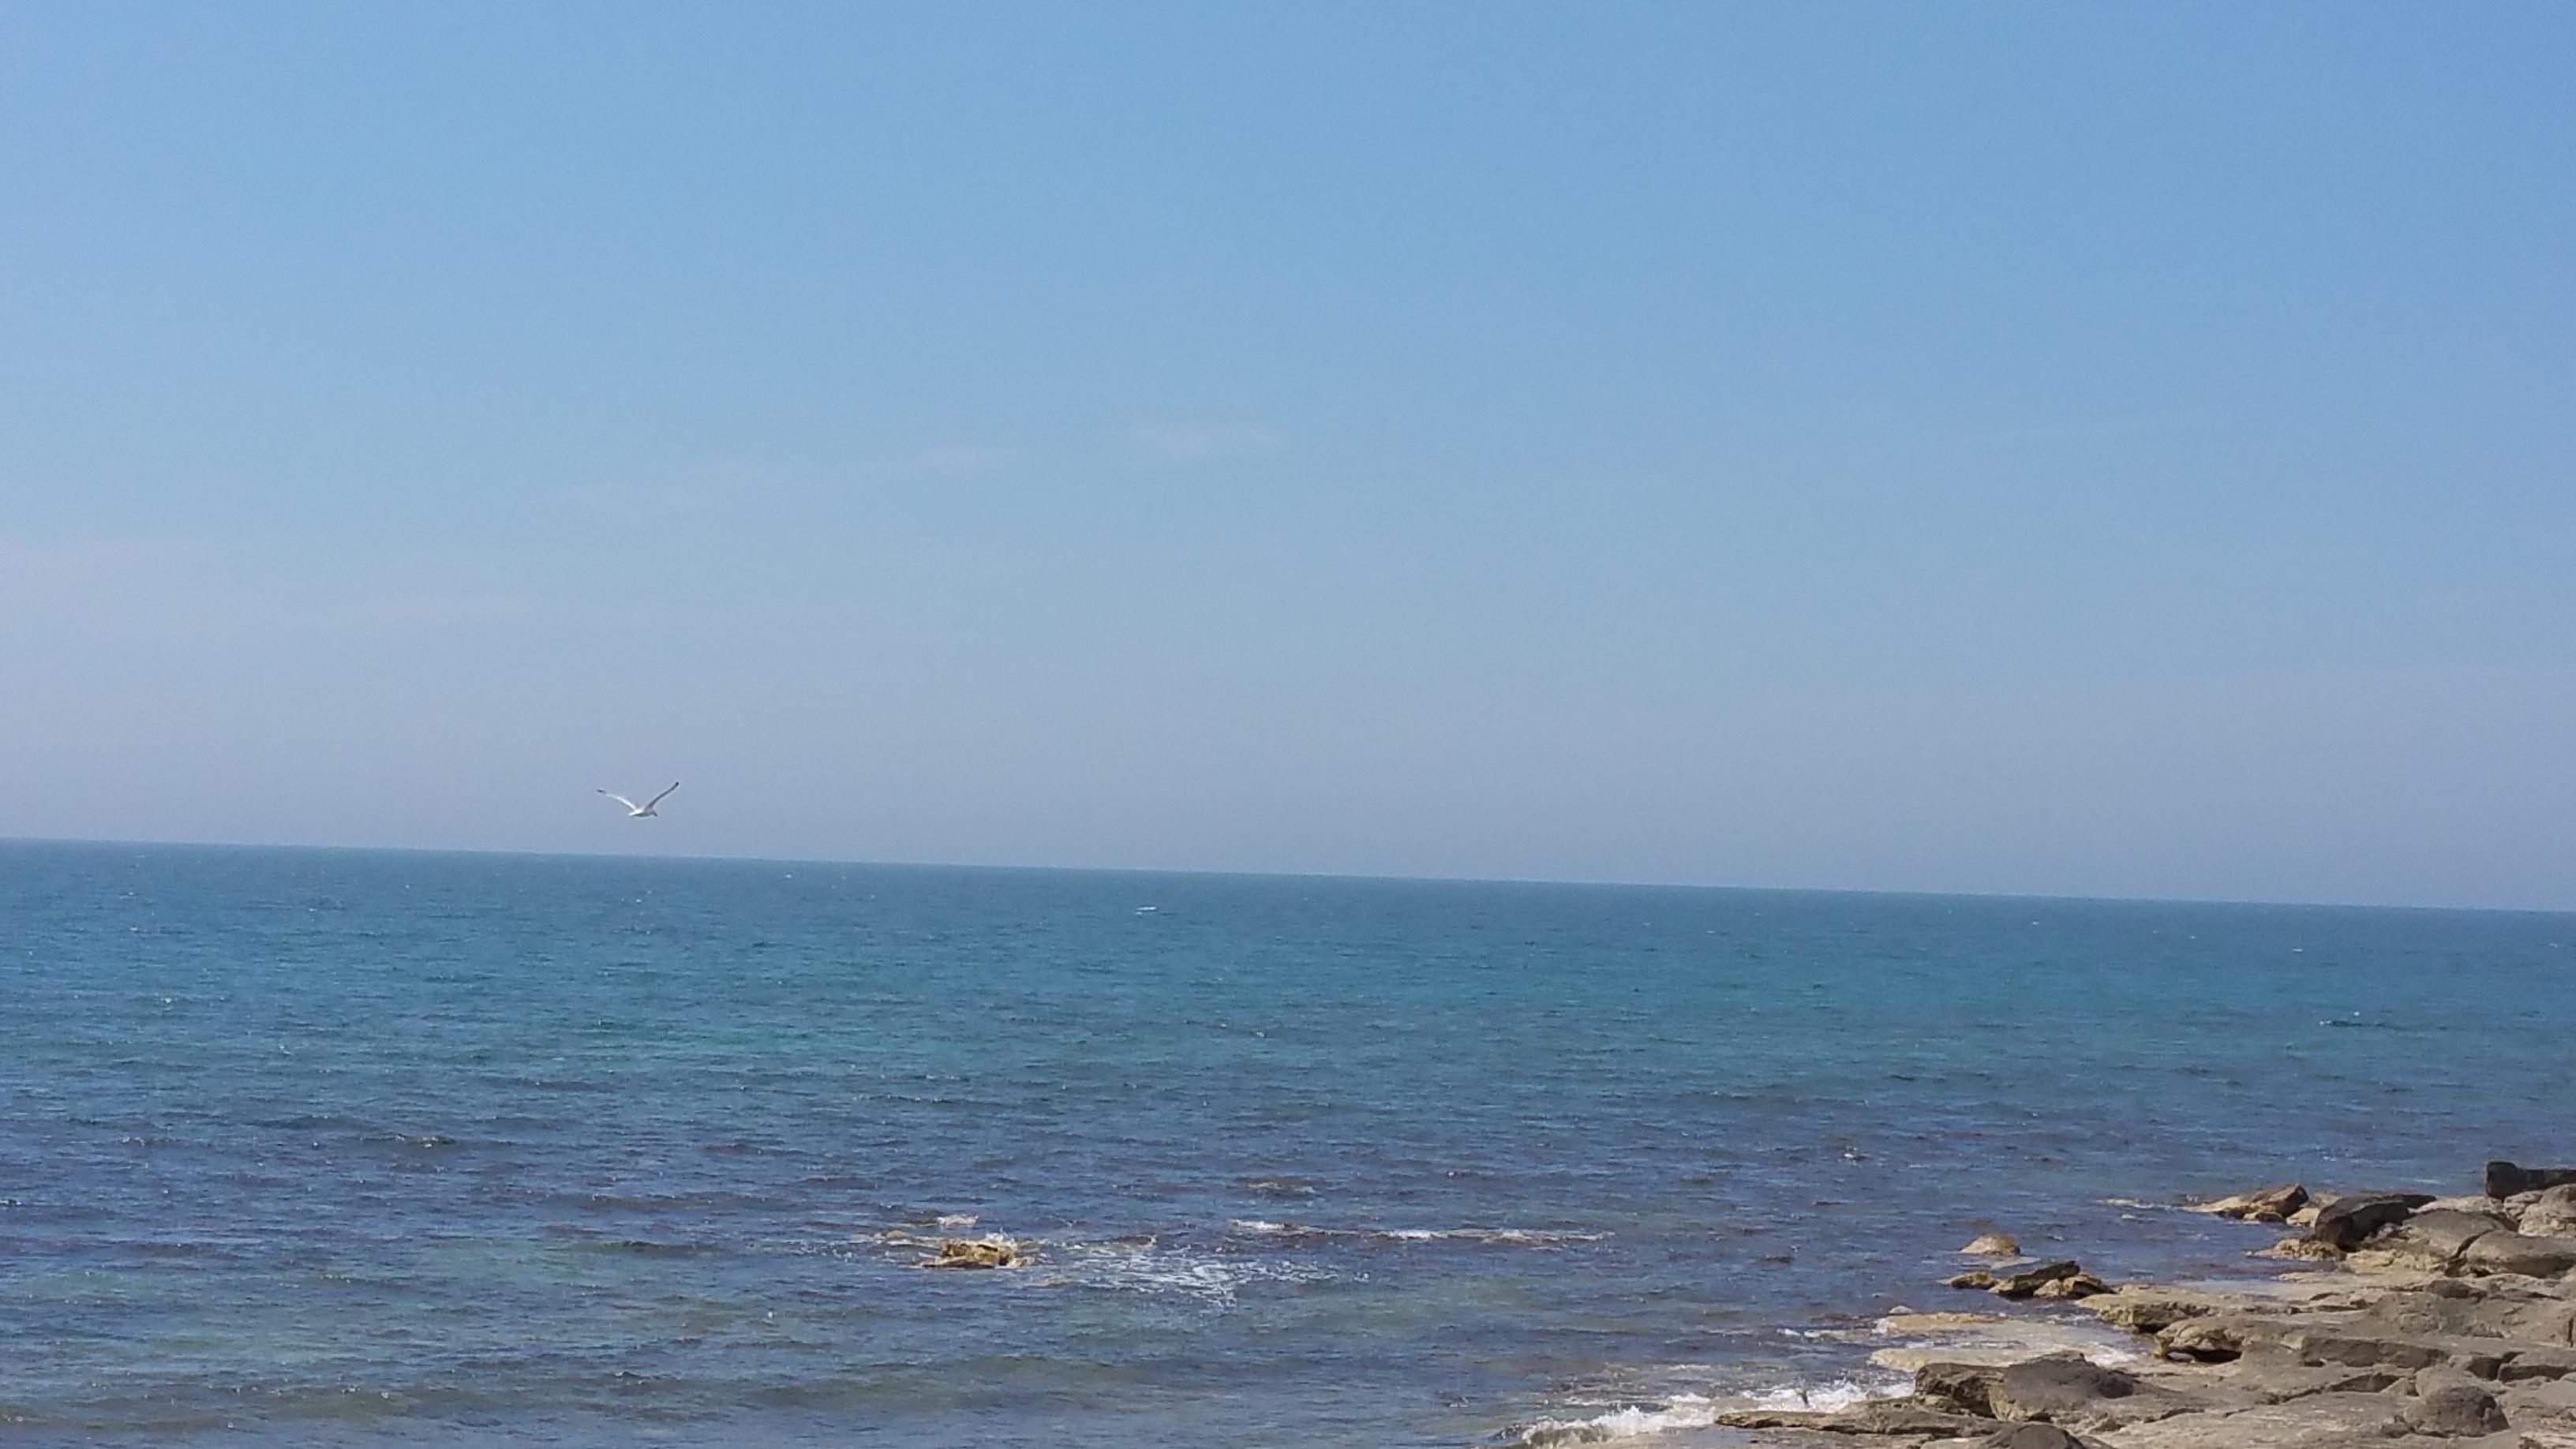 A view of the Caspian Sea, Aktau, Kazakhstan (May, 2015)